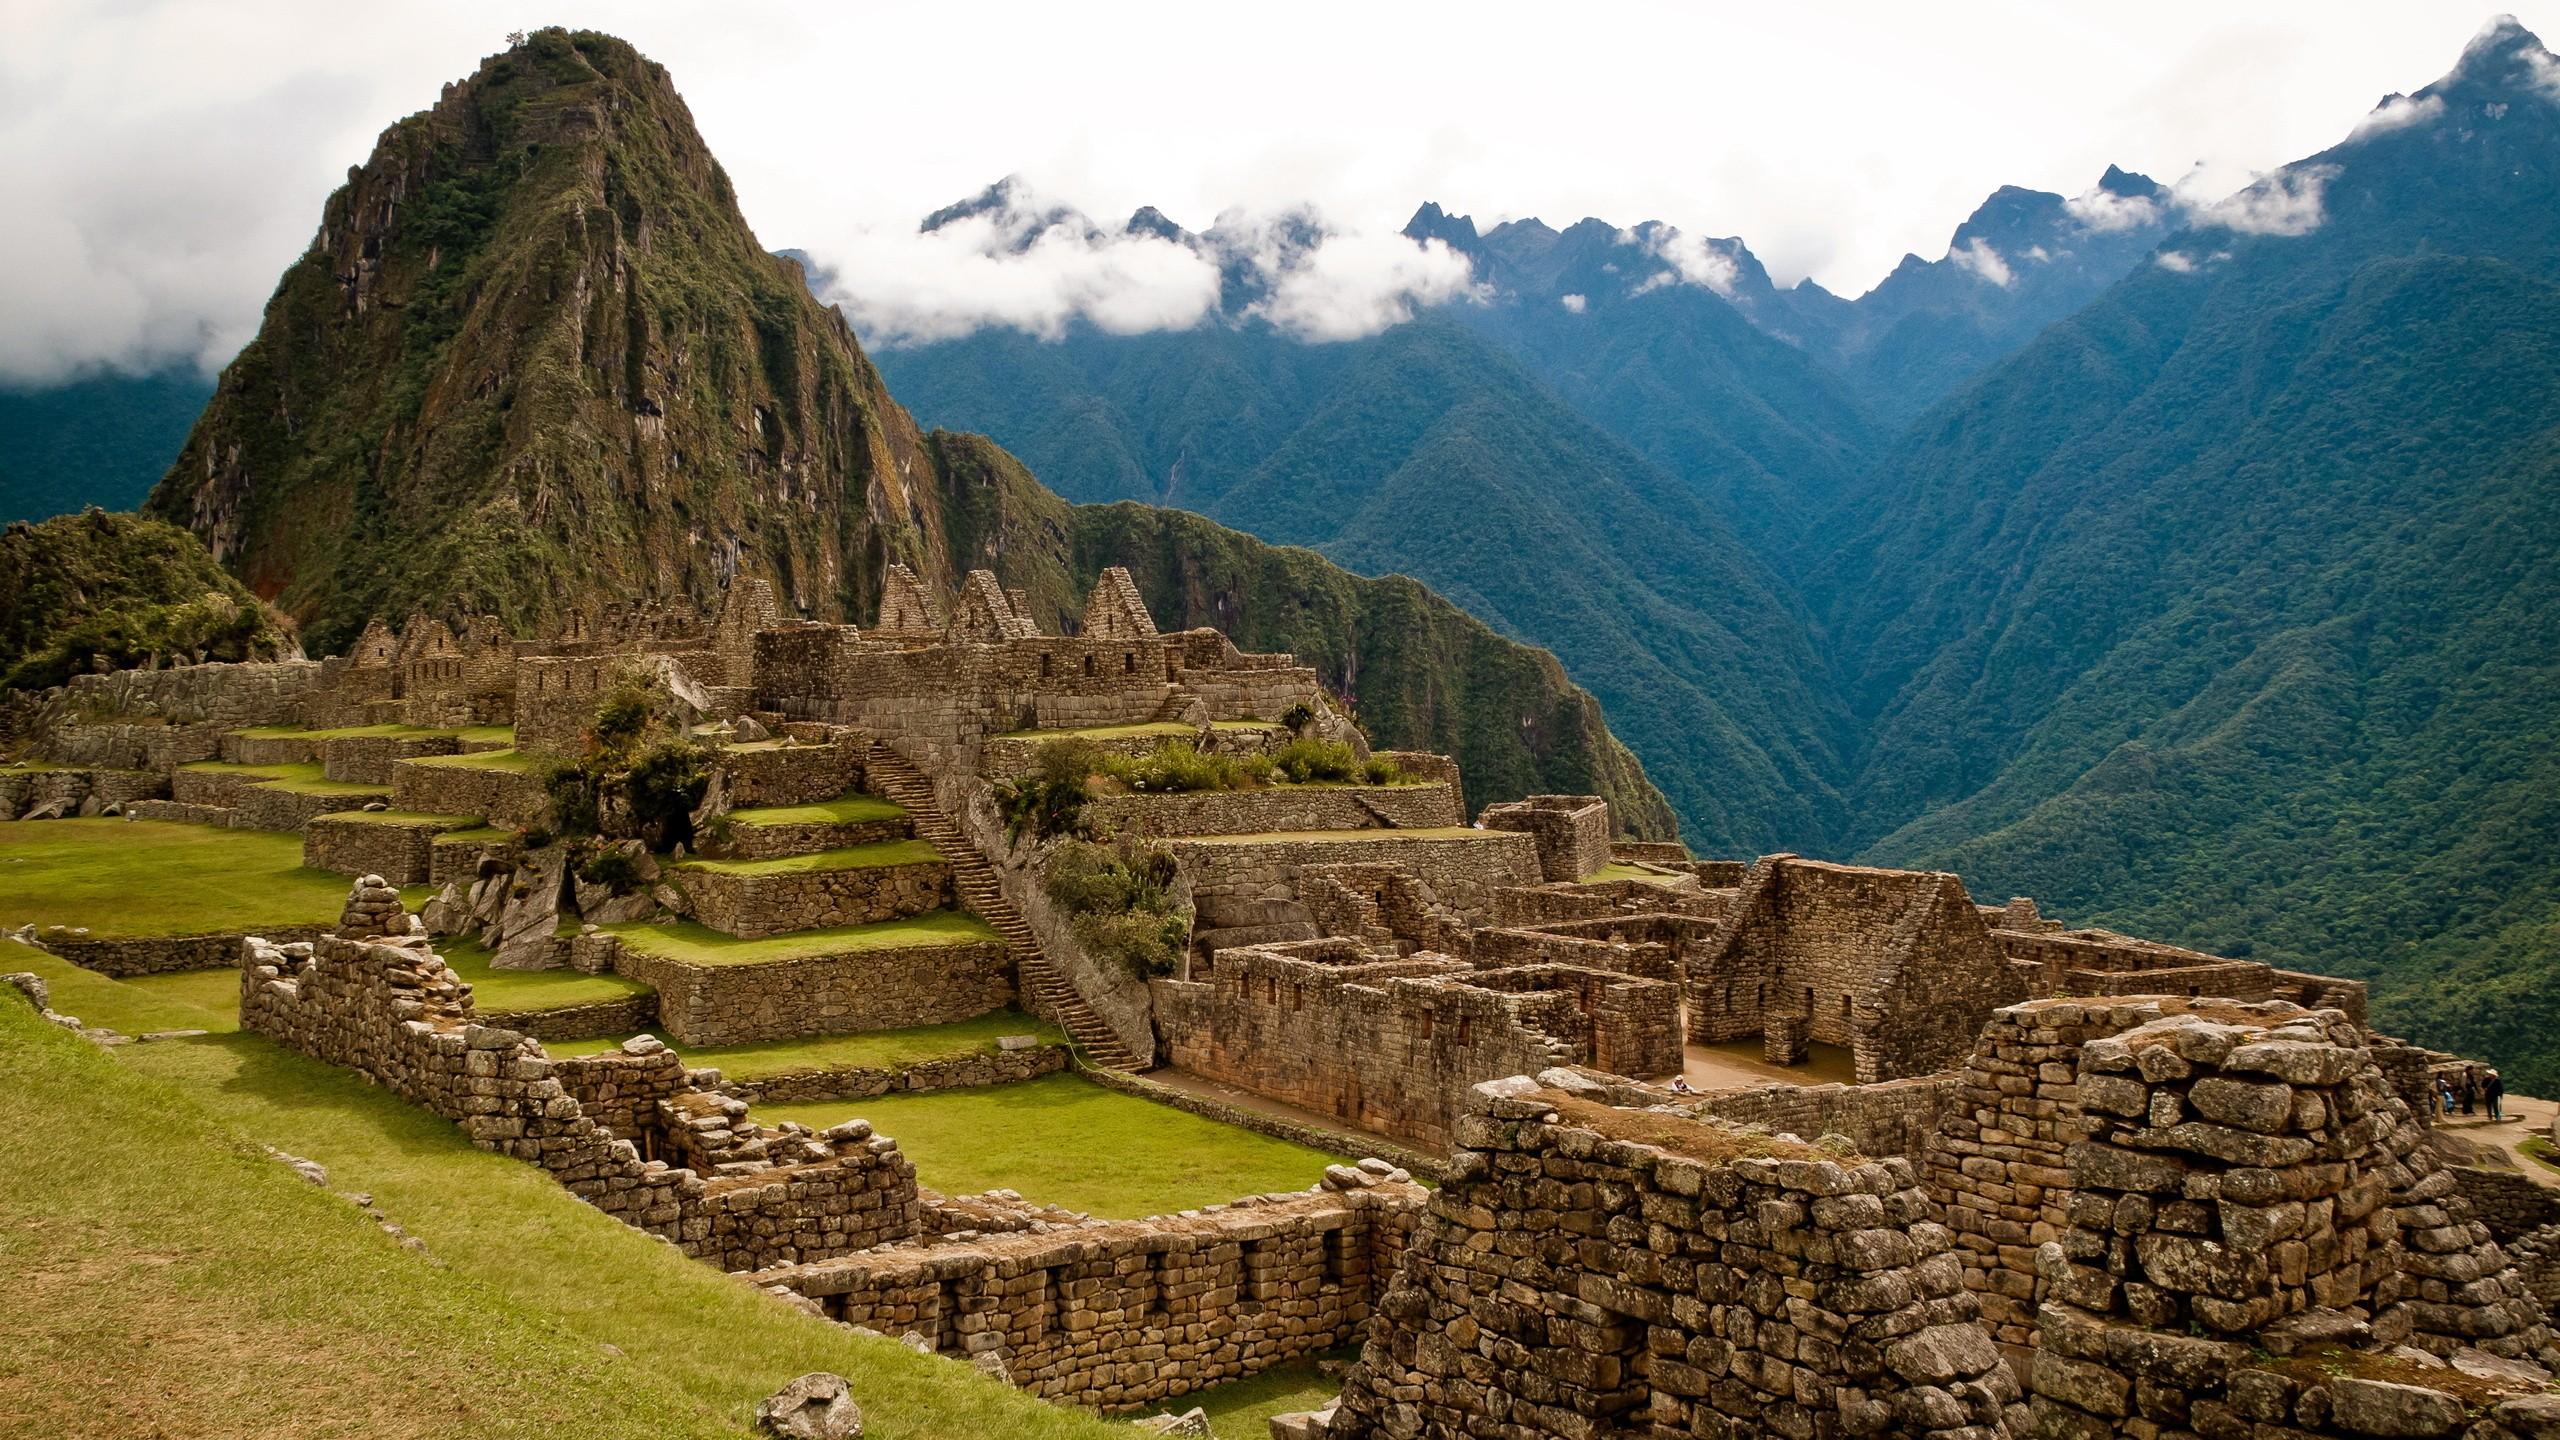 landscapes-nature-ruins-Machu-Picchu-abandoned-city-x-wallpaper-wp427034-1